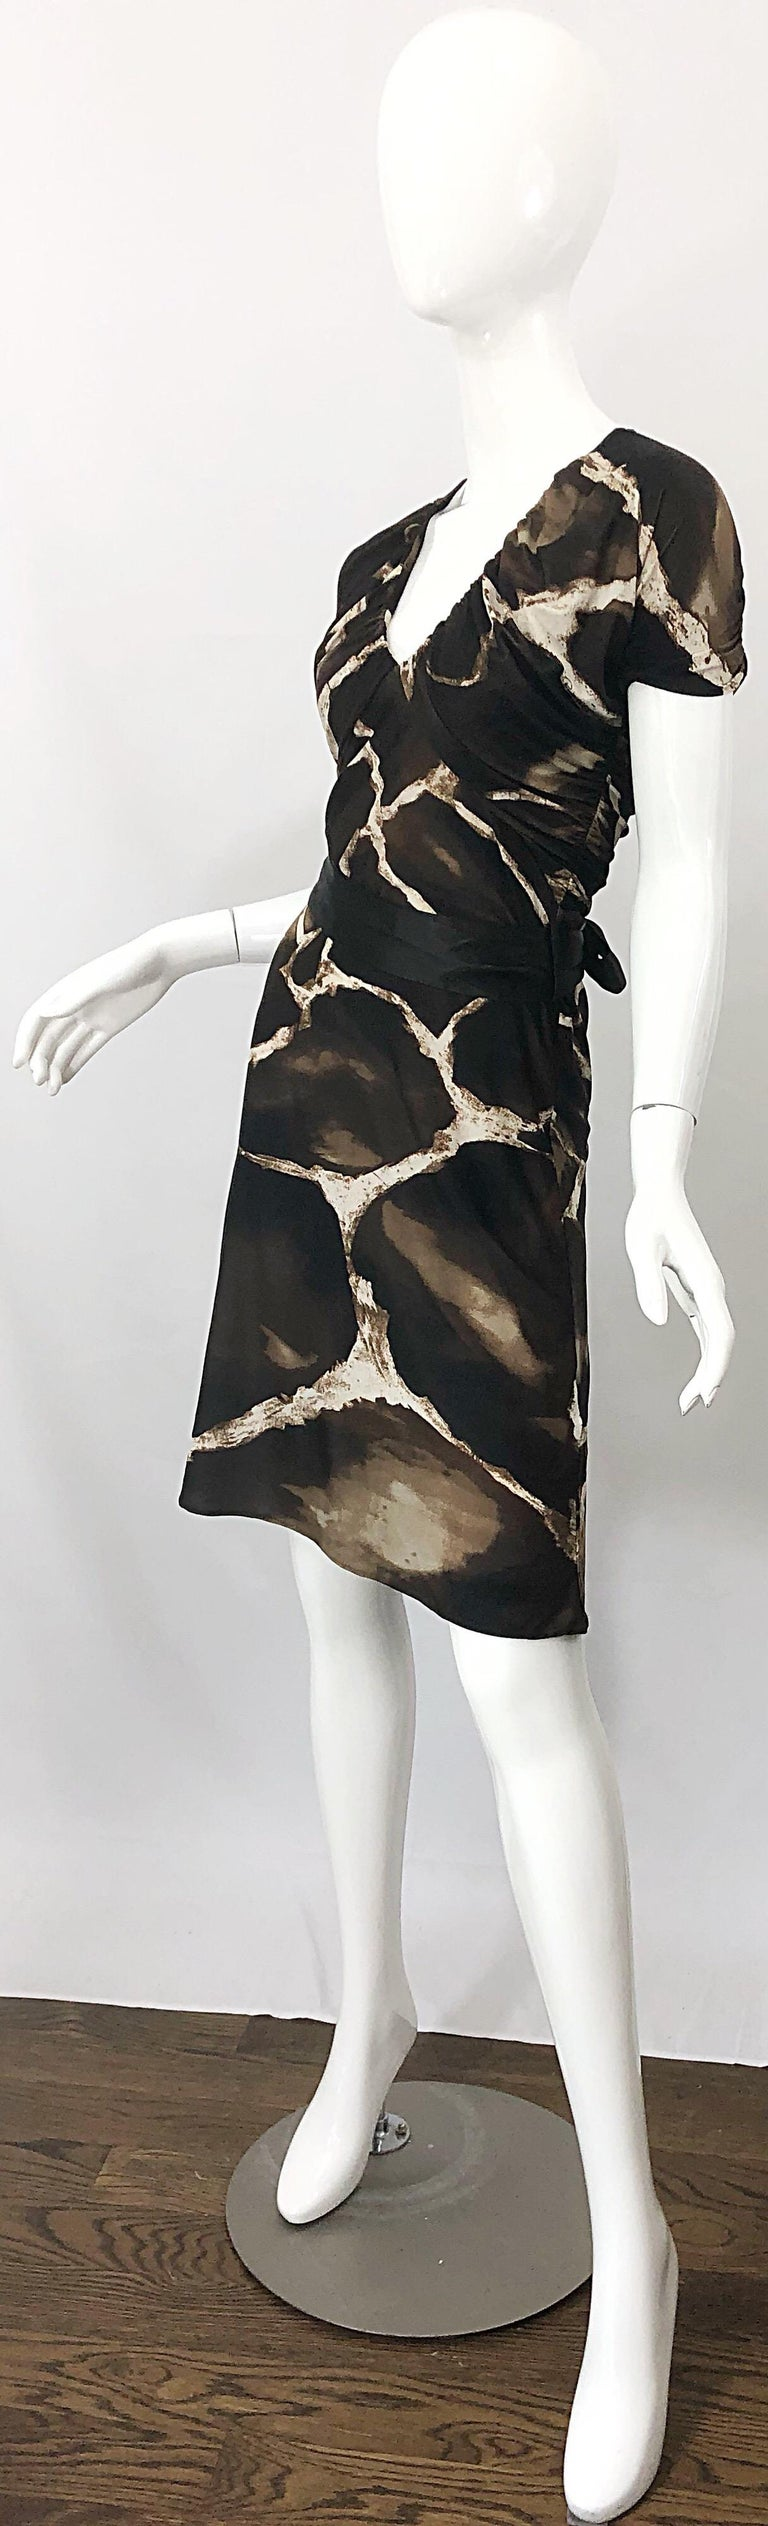 1980s Roberto Cavalli for Neiman Marcus Giraffe Print Vintage 80s Jersey Dress For Sale 1